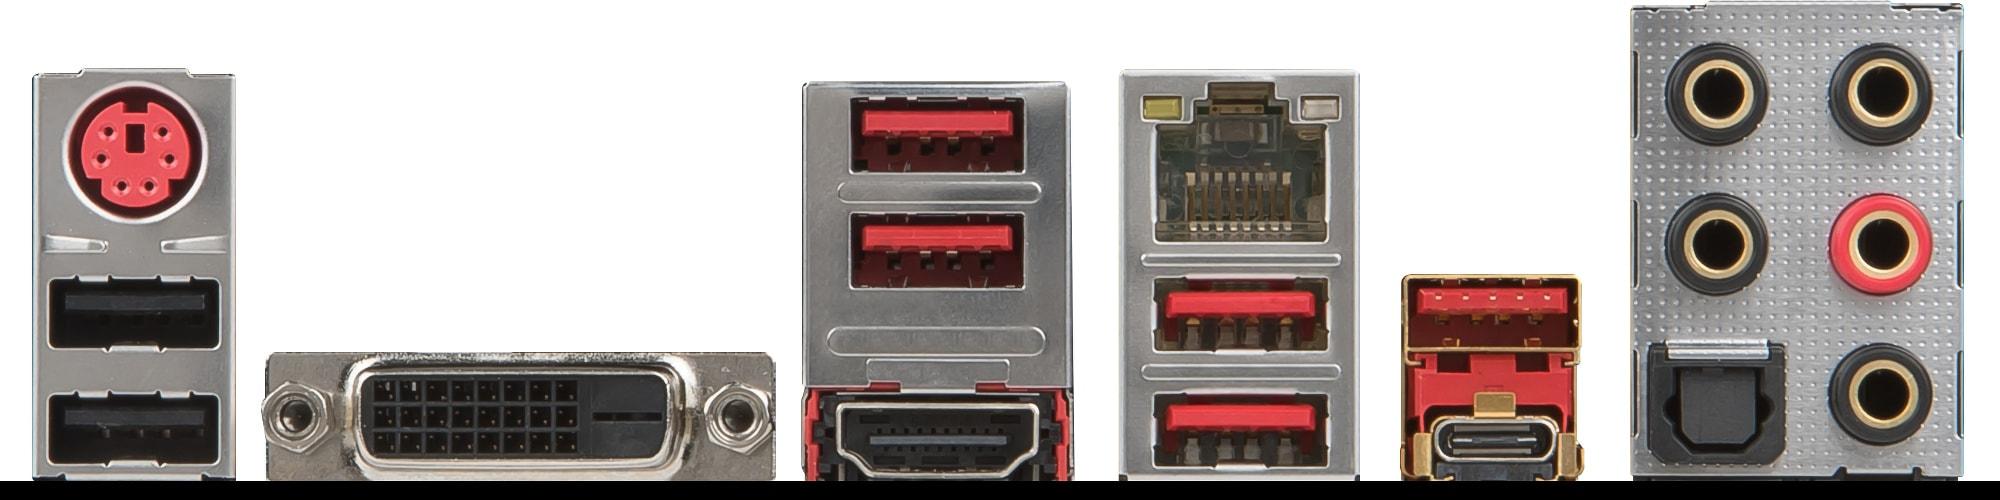 MSI X370 GAMING PRO CARBON ATX DDR4 - Carte mère MSI - Cybertek.fr - 3